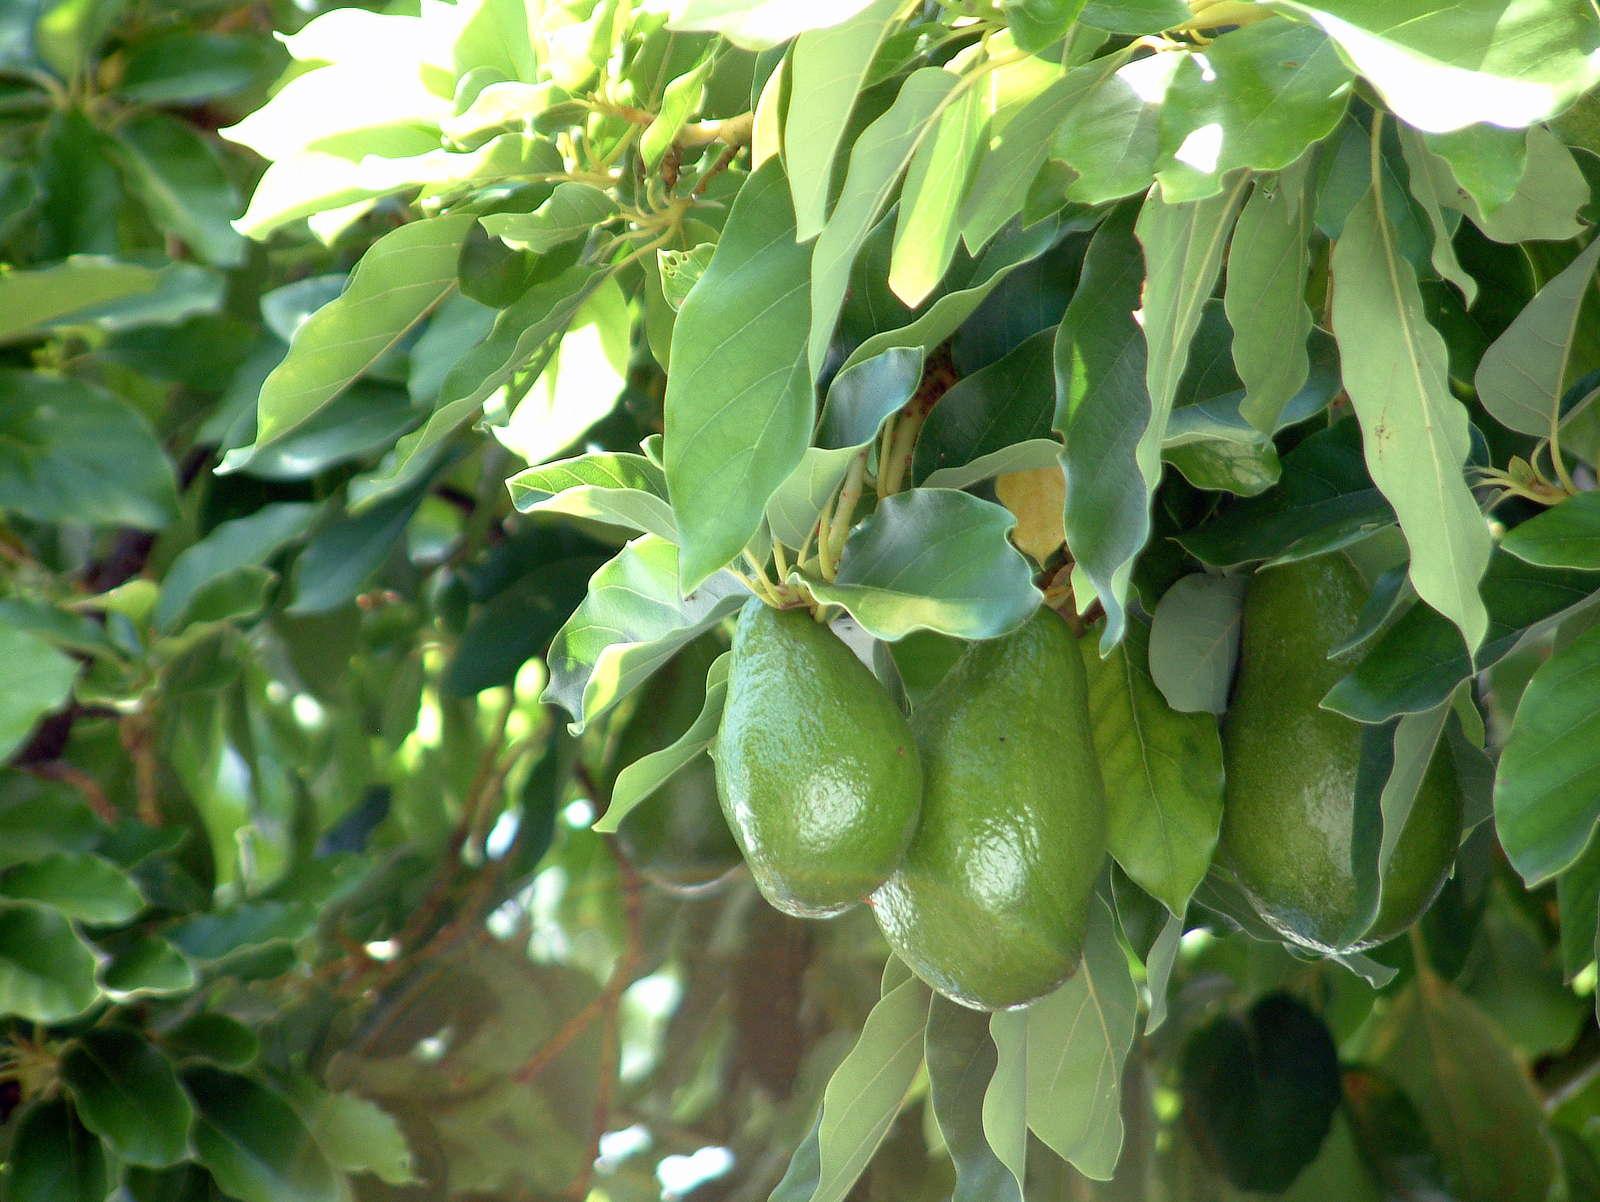 avocadokern einpflanzen zahnstocher avocado selbst anpflanzen avocado crme dip avocado. Black Bedroom Furniture Sets. Home Design Ideas